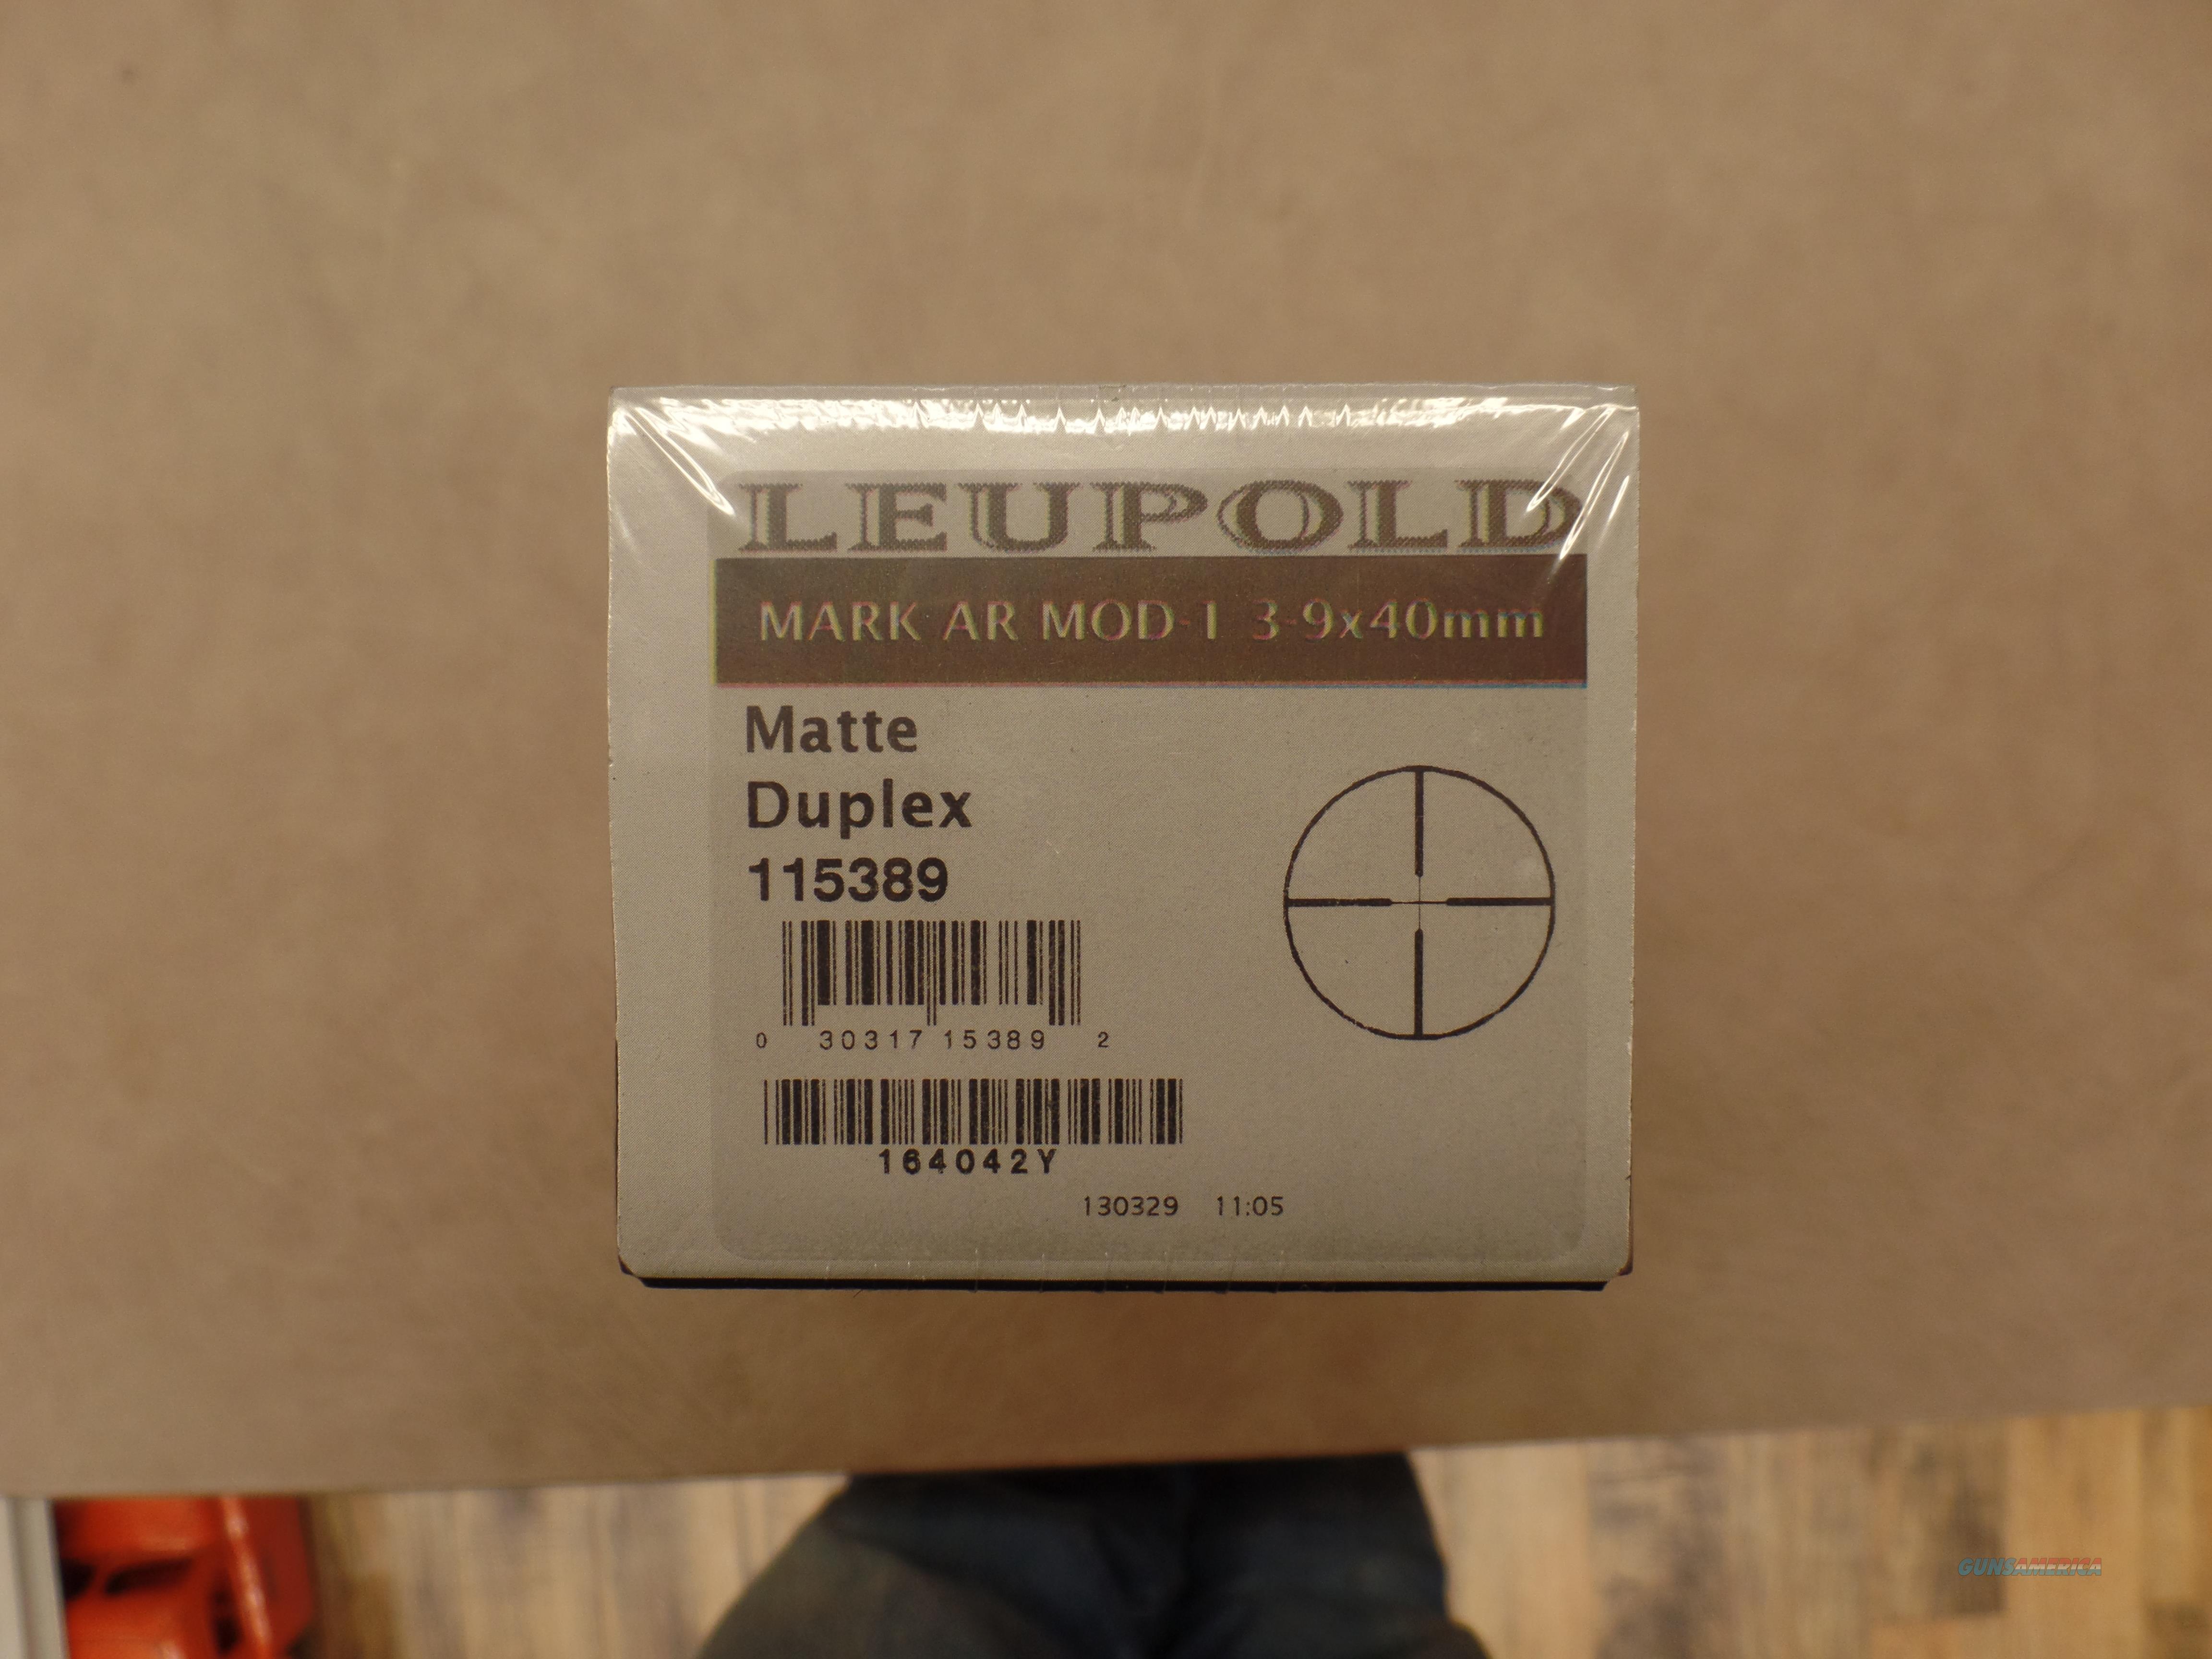 Leupold MARK AR MOD 1 3-9X40 Matte  Non-Guns > Scopes/Mounts/Rings & Optics > Tactical Scopes > Other Head-Up Optics